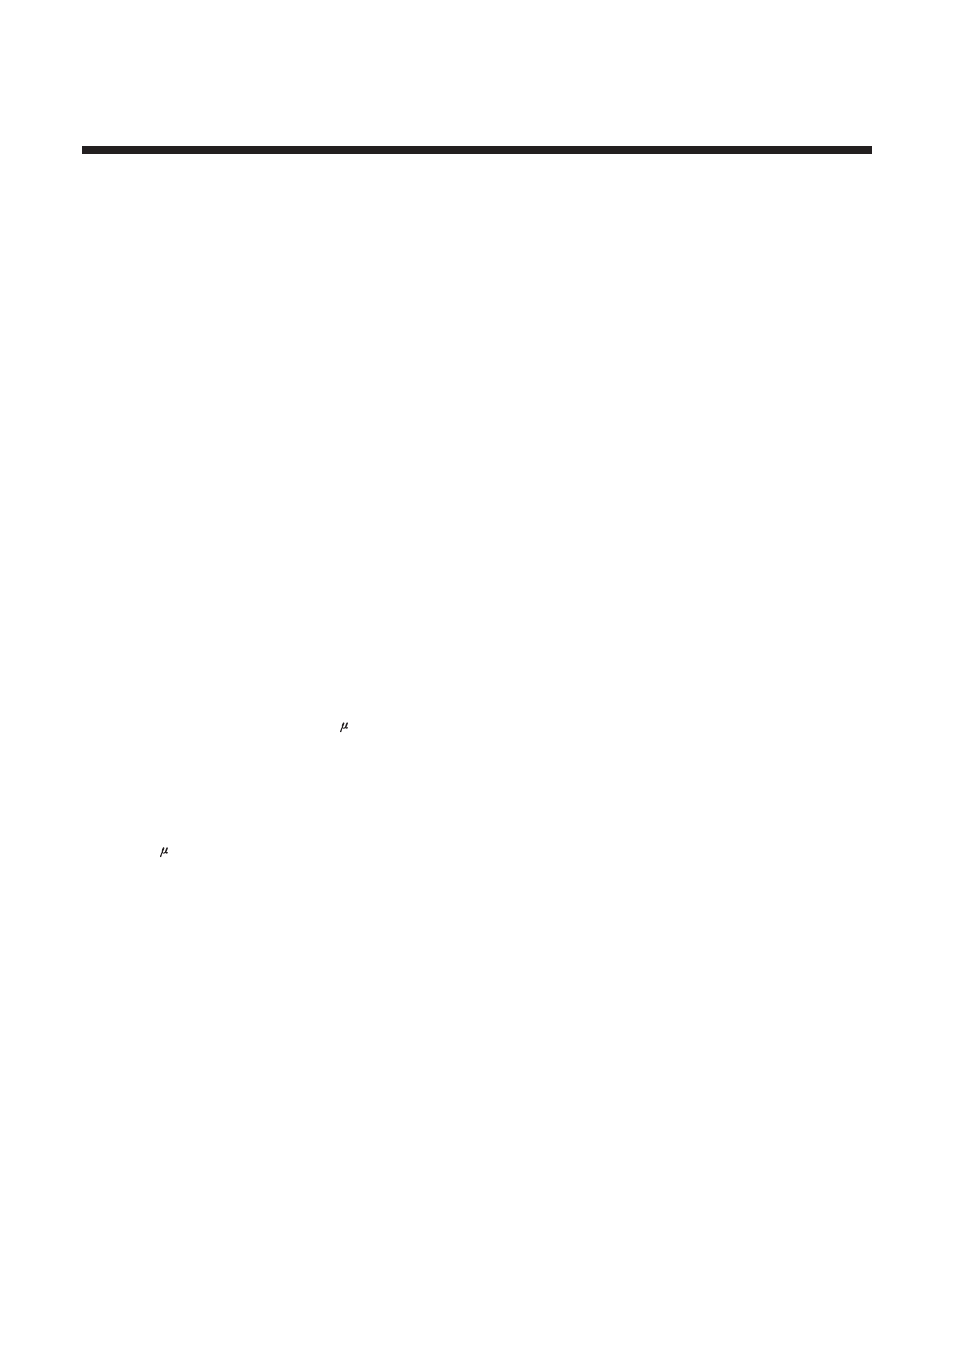 Tda8356 Vertical Deflection Horizontal Daewoo 14q1 Resistors In Series Connected User Manual Page 36 77